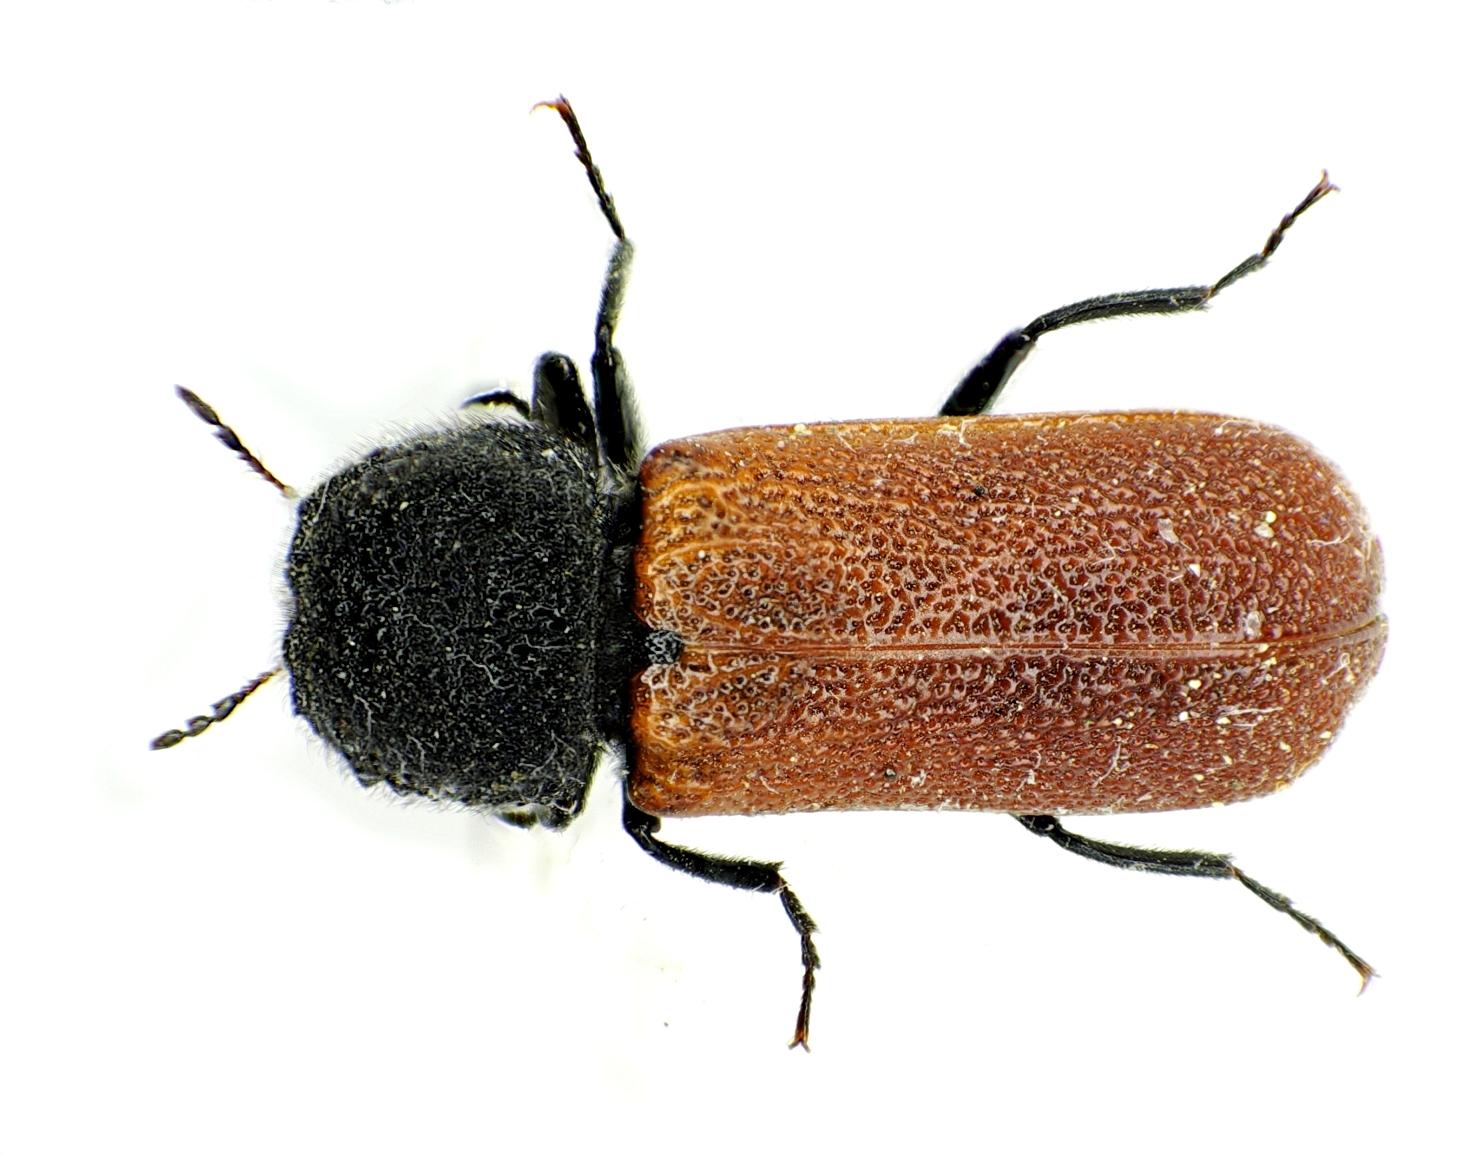 a short review of the capucinus magnauris